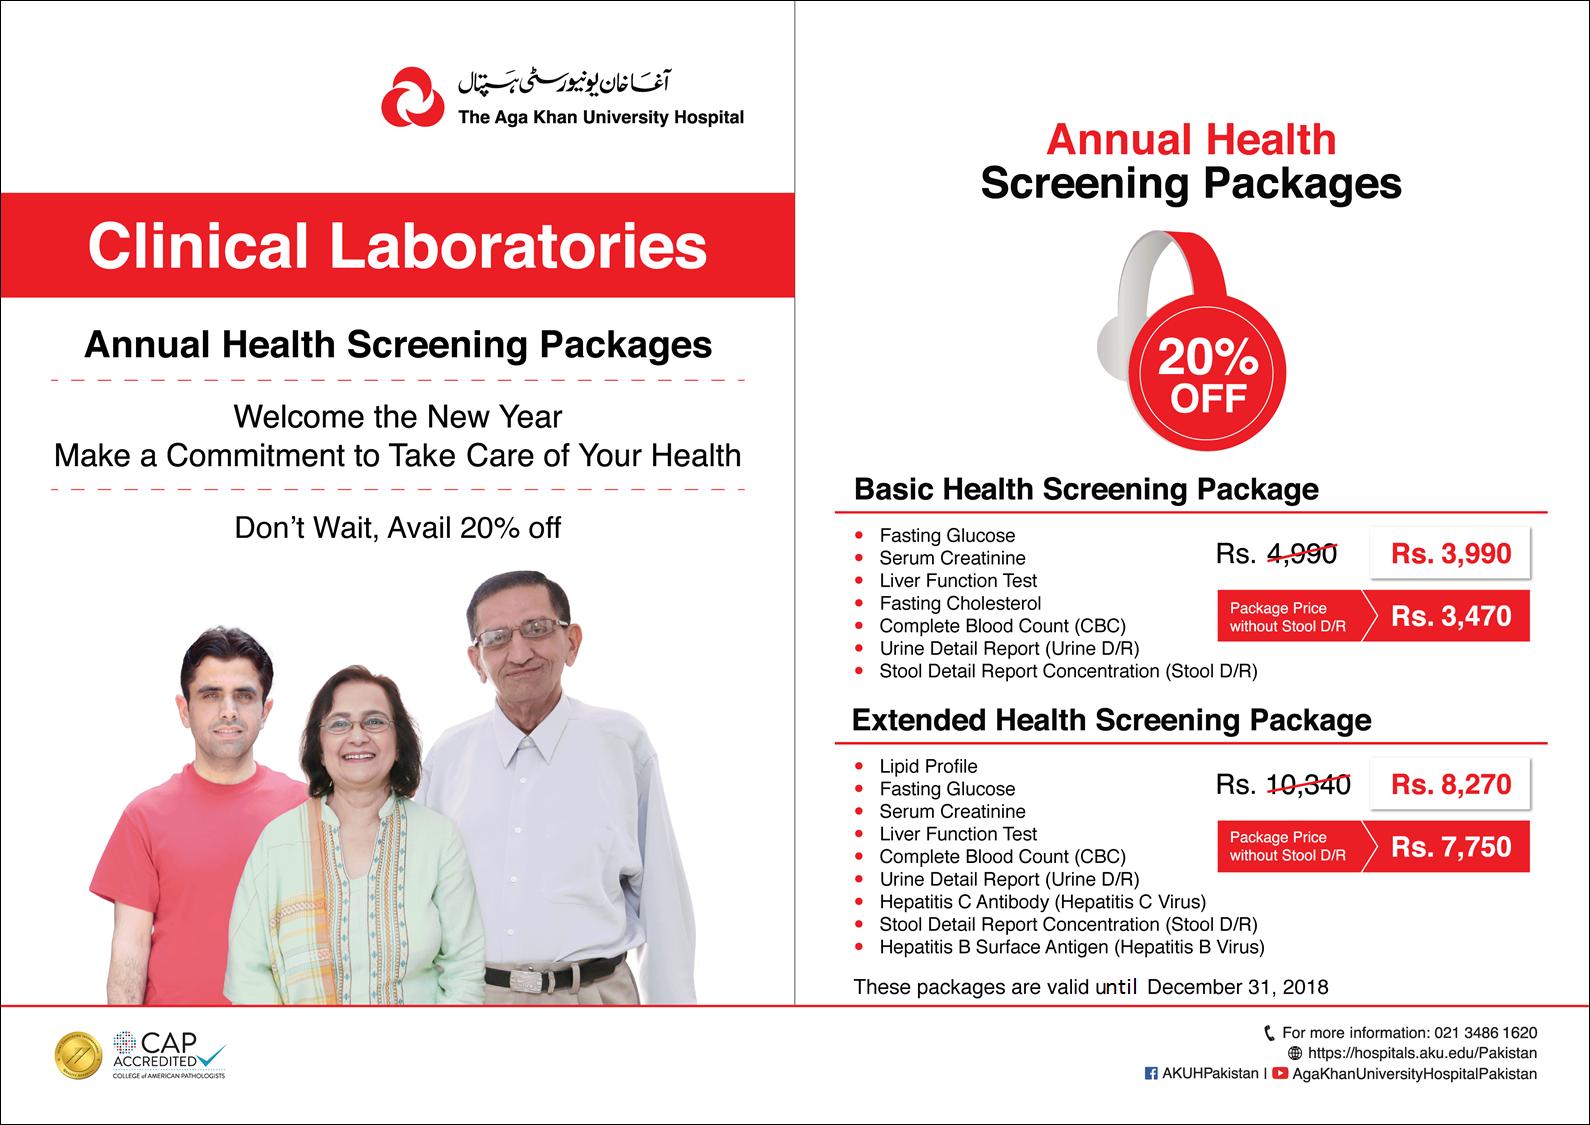 Health Screening Packages Of Akuh 2018 Akuh Agakhan Healthcare Healthscreening Health Screening Health Health Care